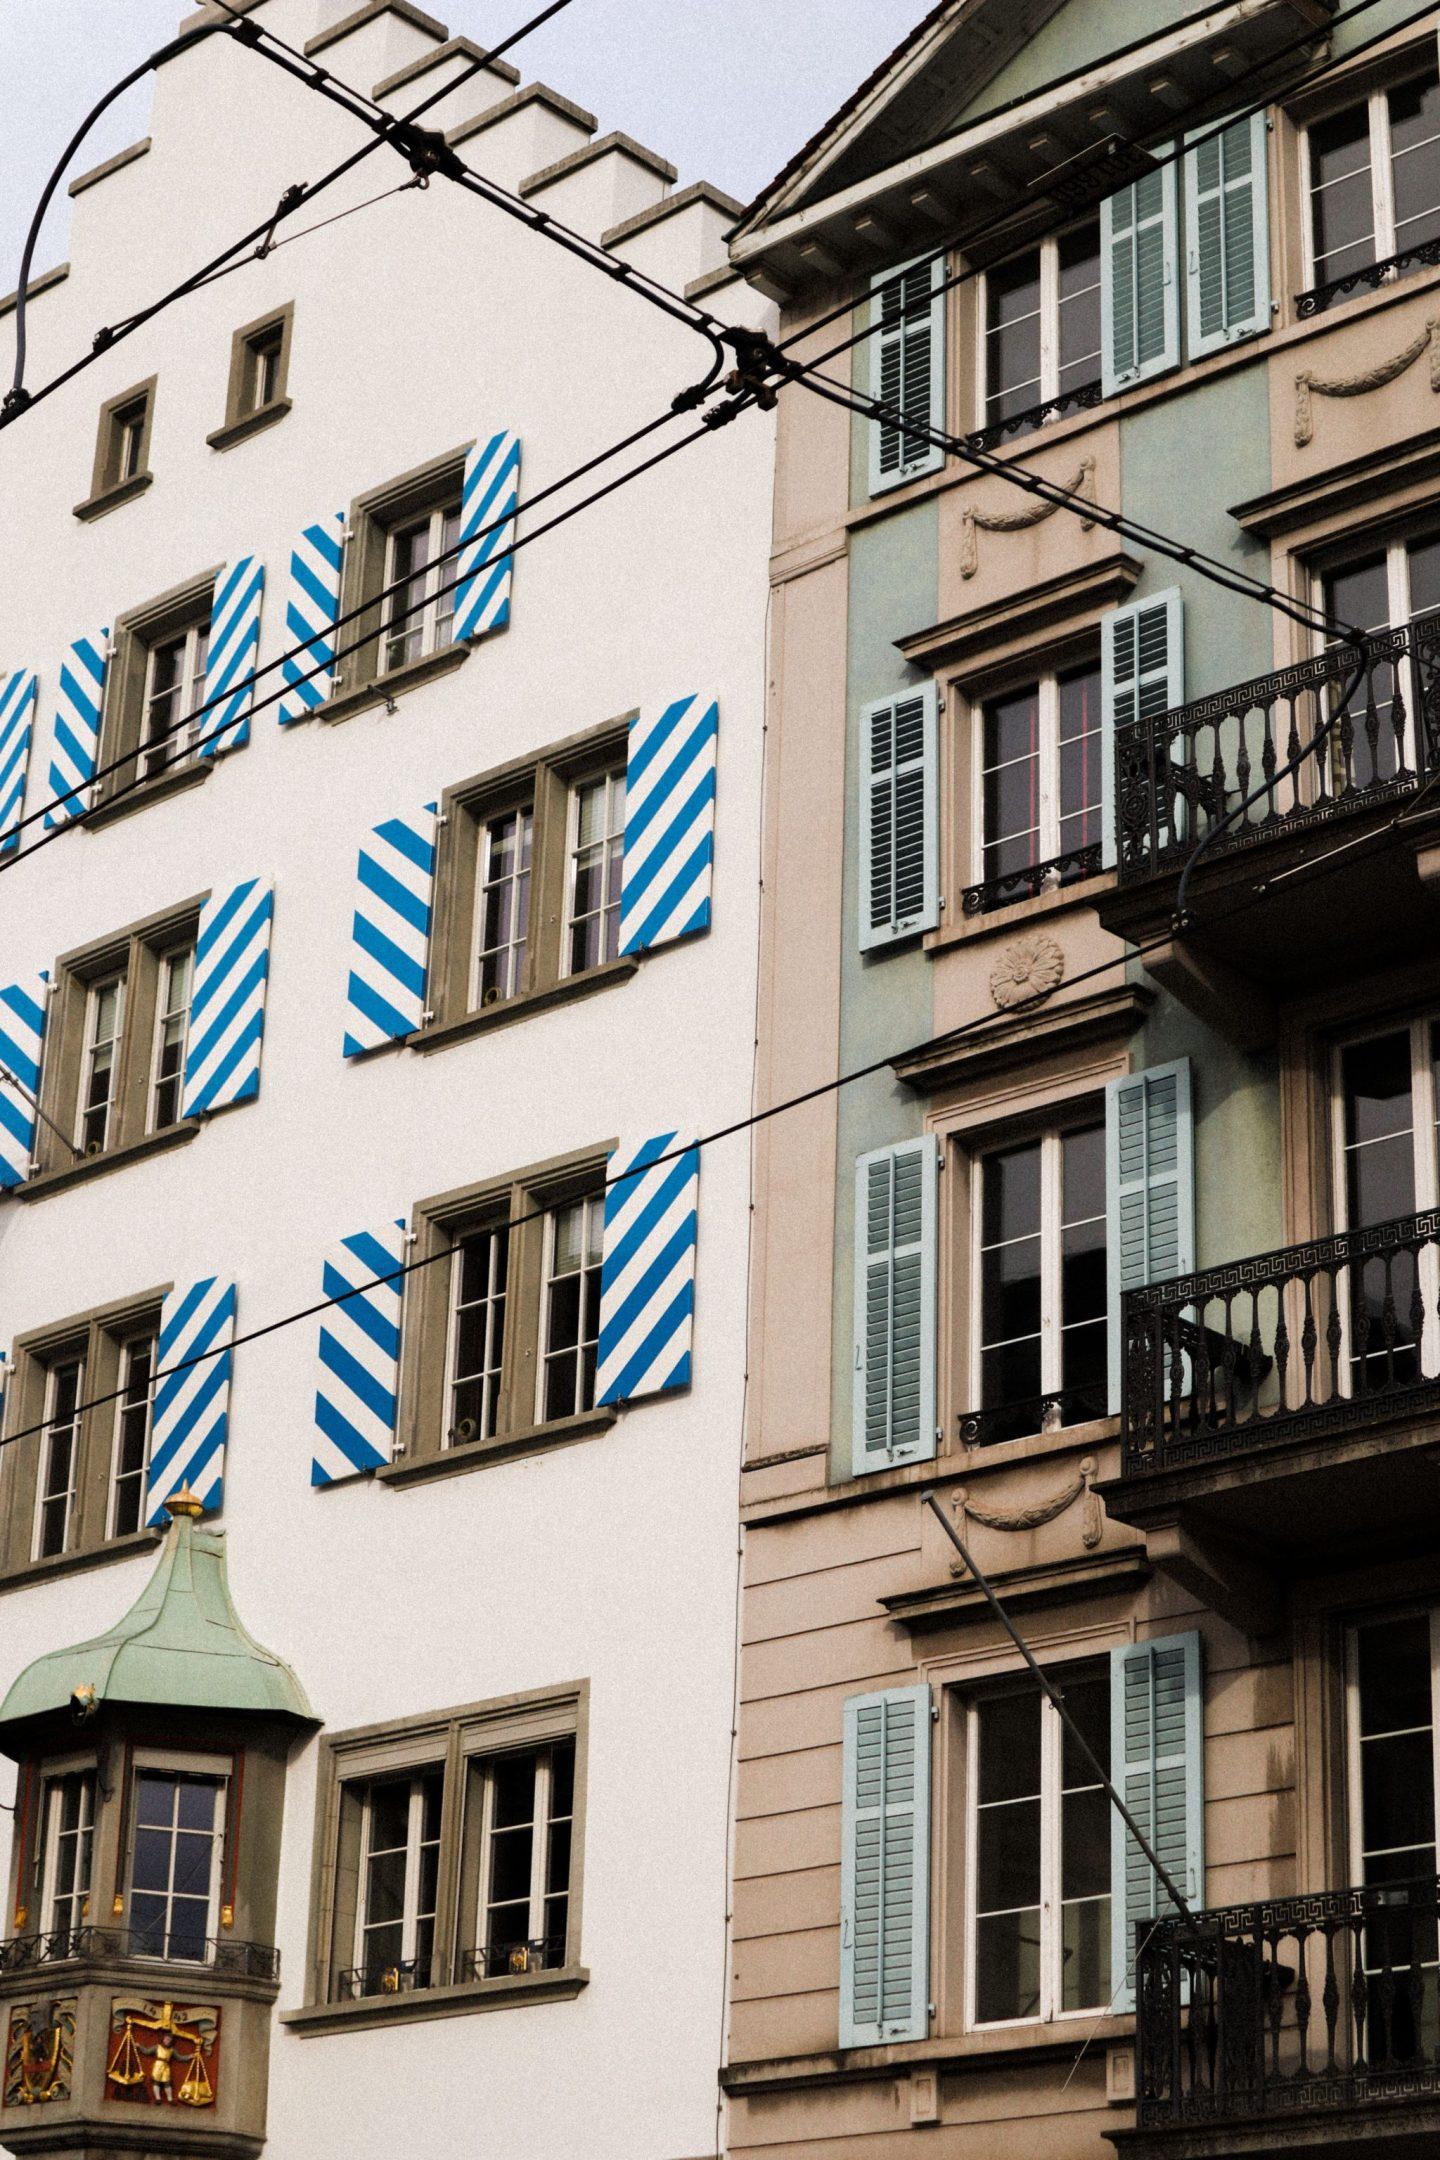 Zurich city houses